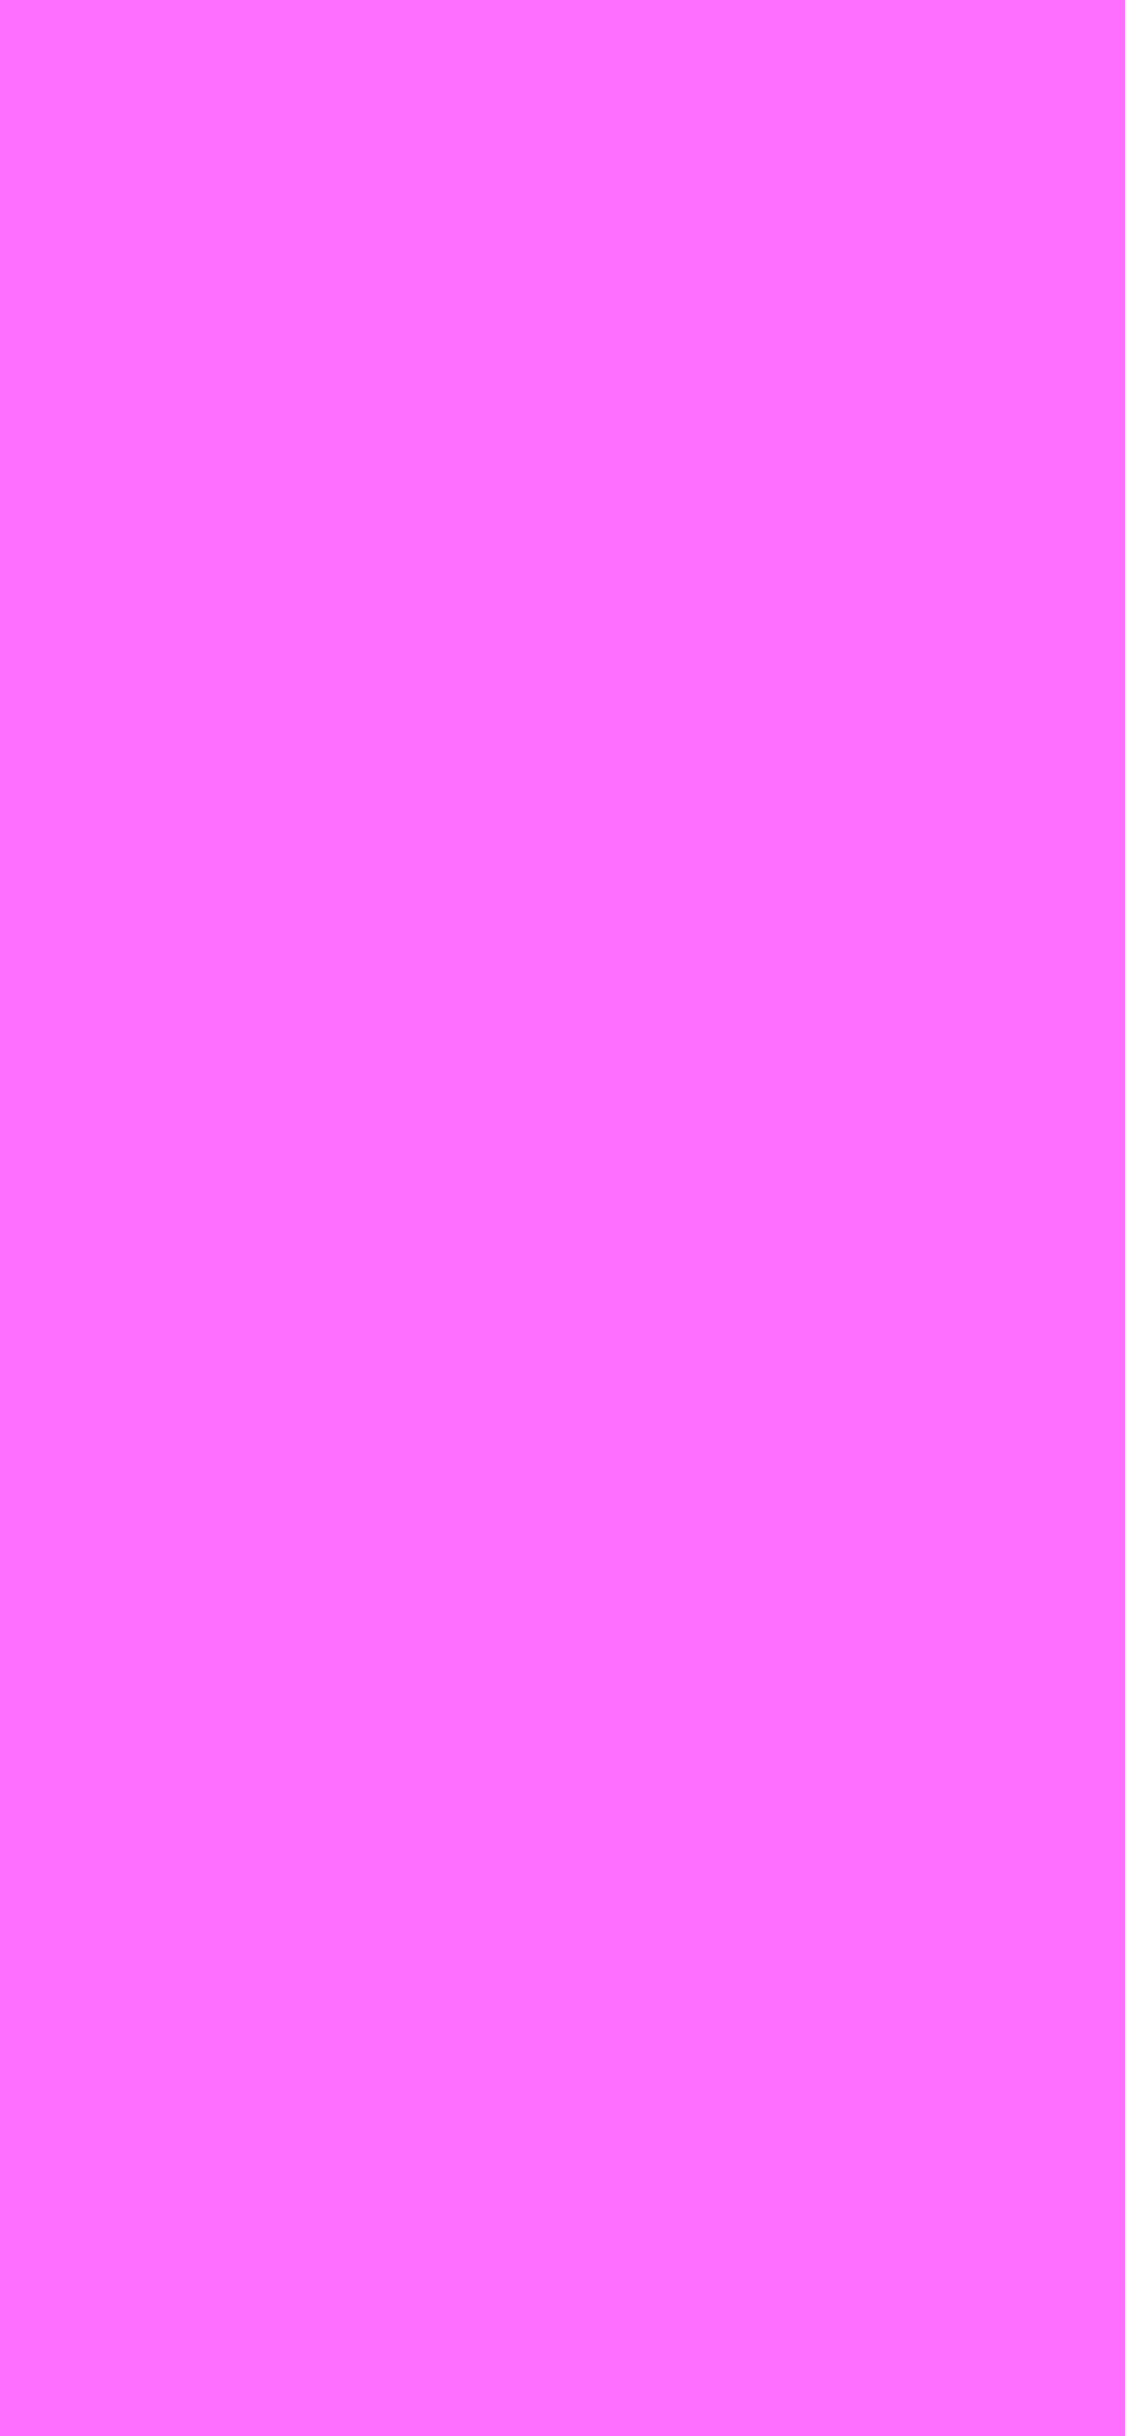 1125x2436 Shocking Pink Crayola Solid Color Background